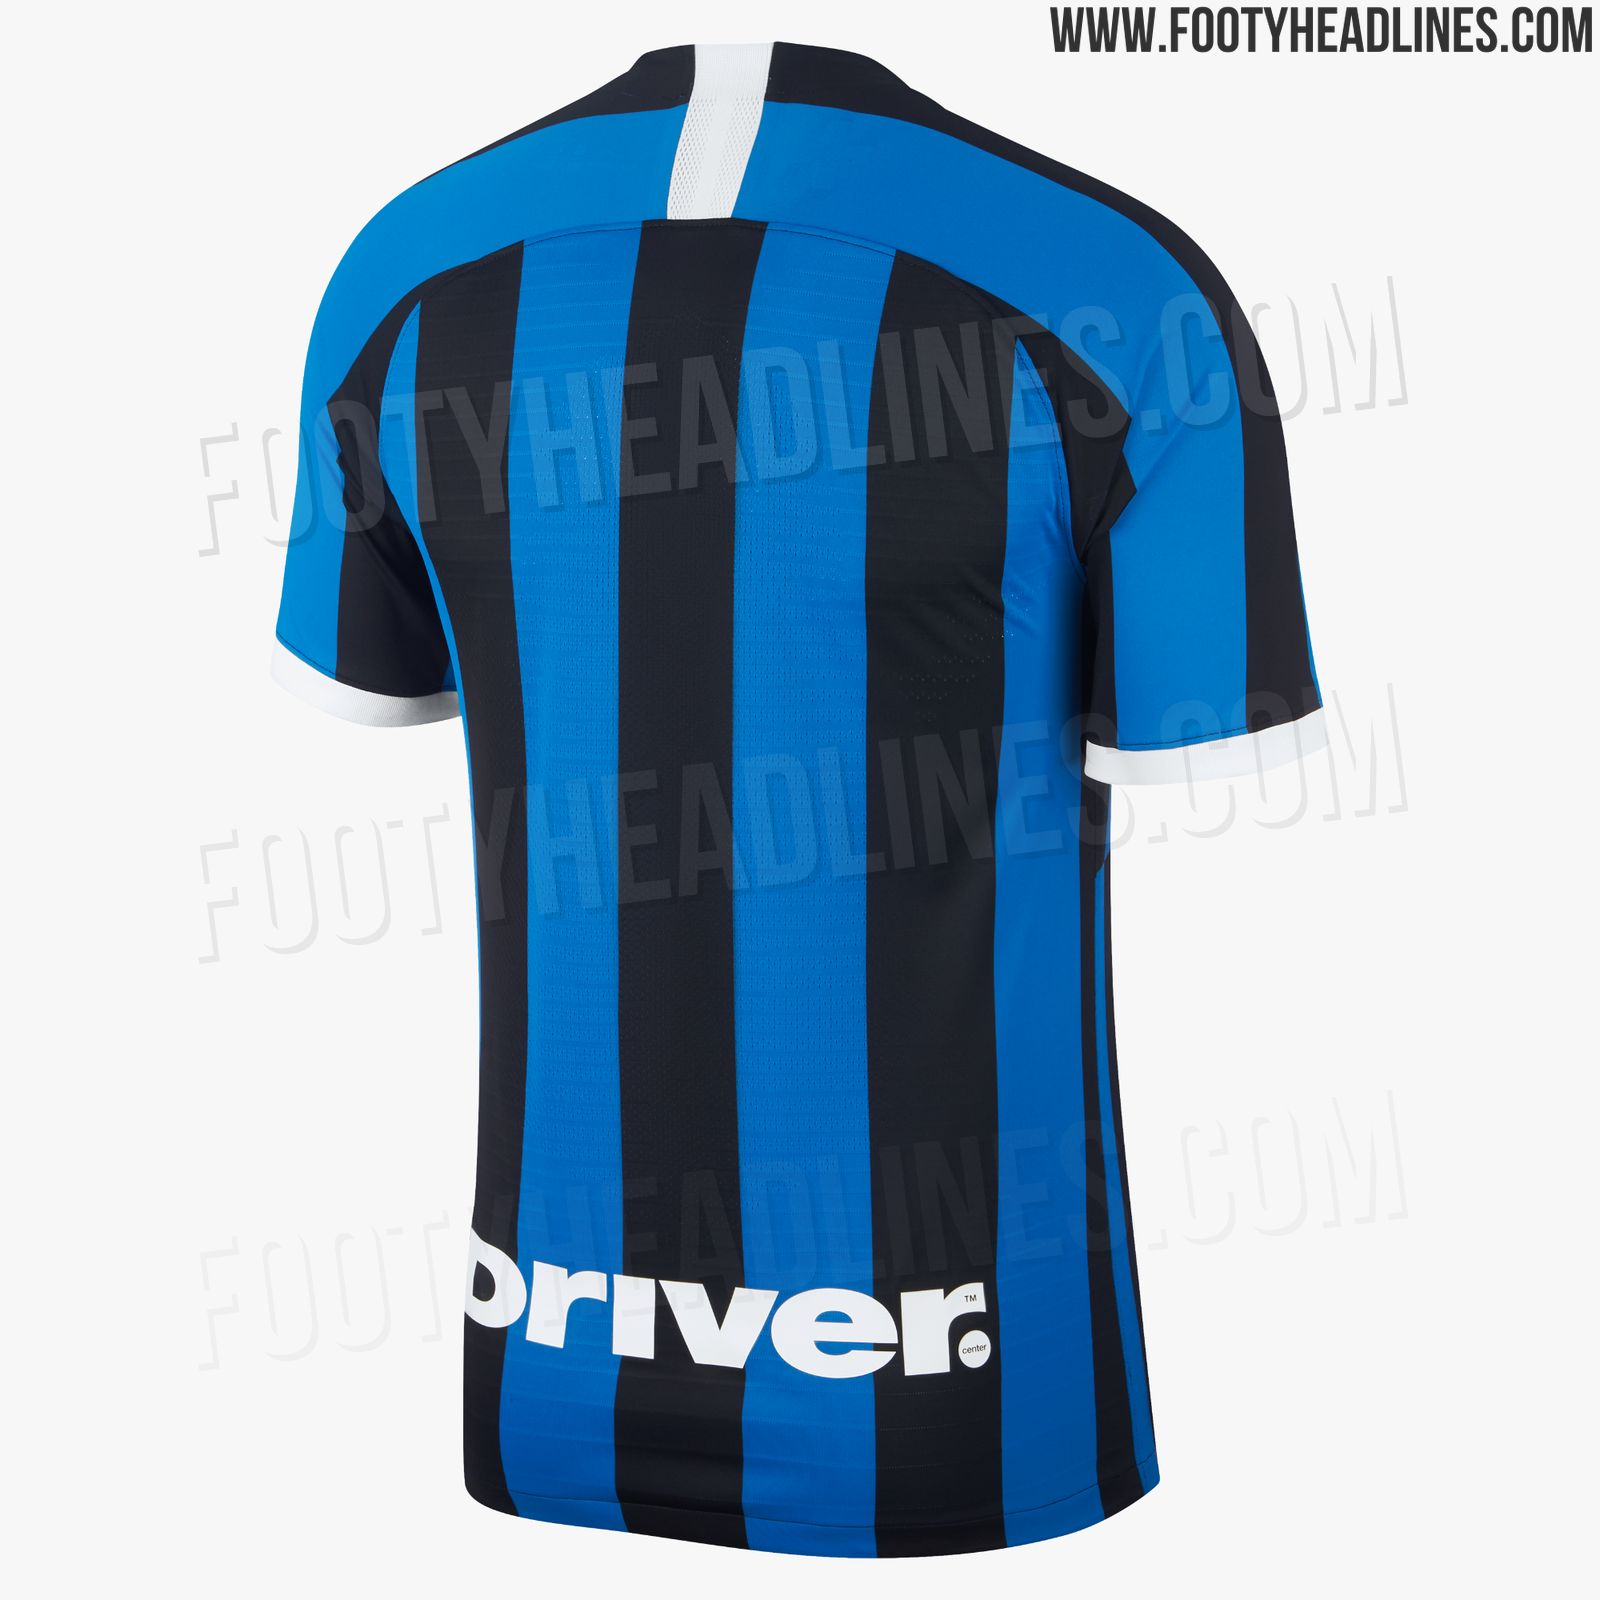 49903628611a79 Domowa koszulka Interu na nowy sezon [FOTO]